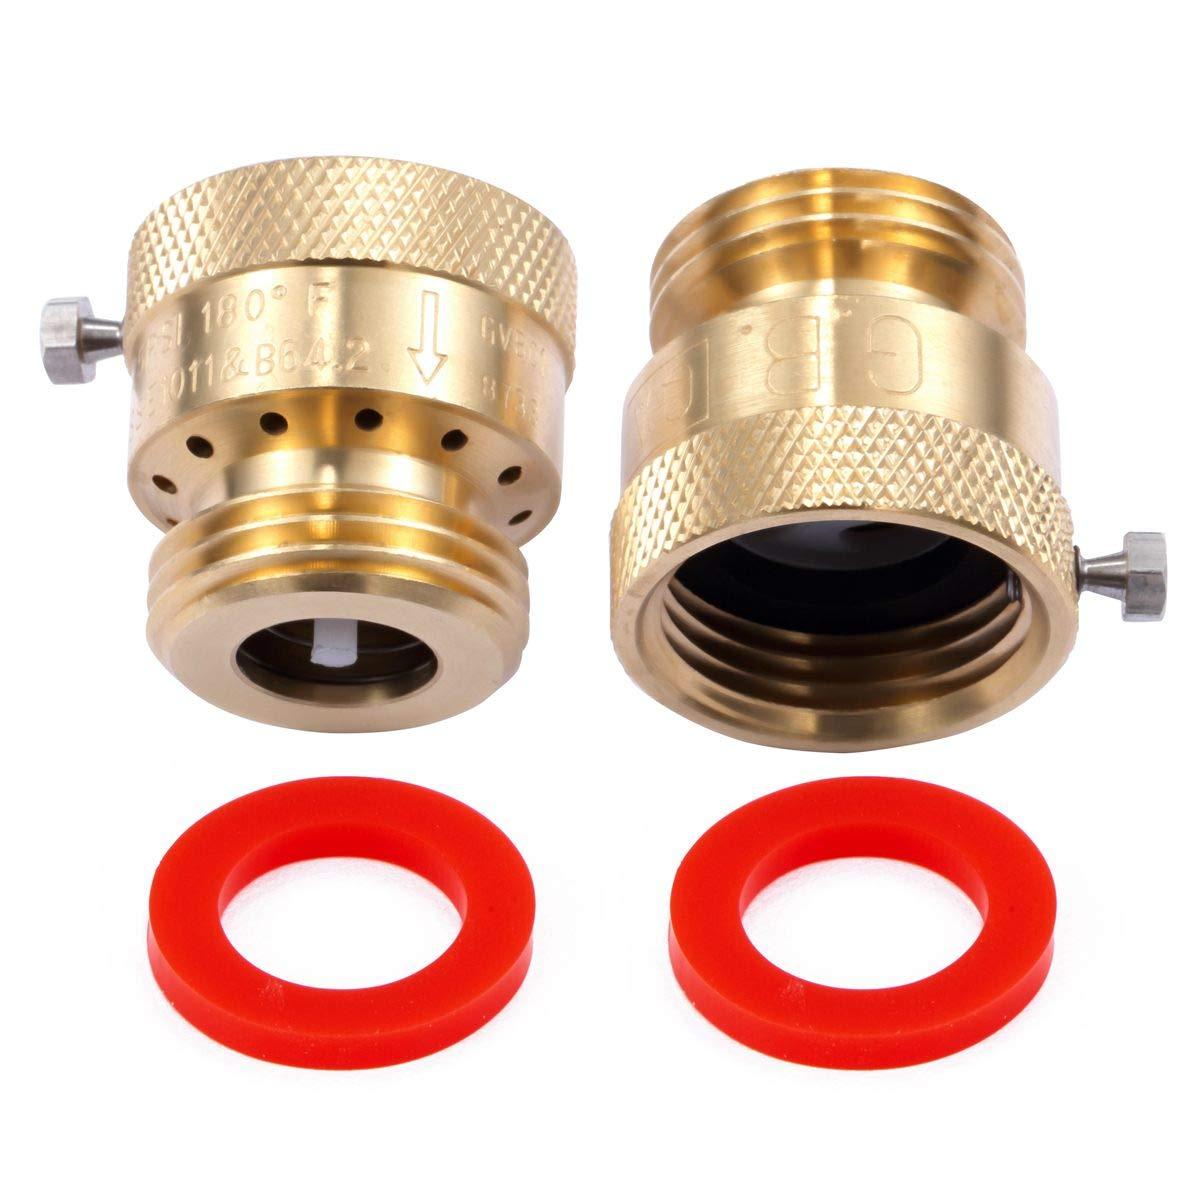 Litorange 2 Pack Brass 3/4'' Inch MHT Hose Bibb Connector Backflow Preventer Vacuum Breaker by Litorange